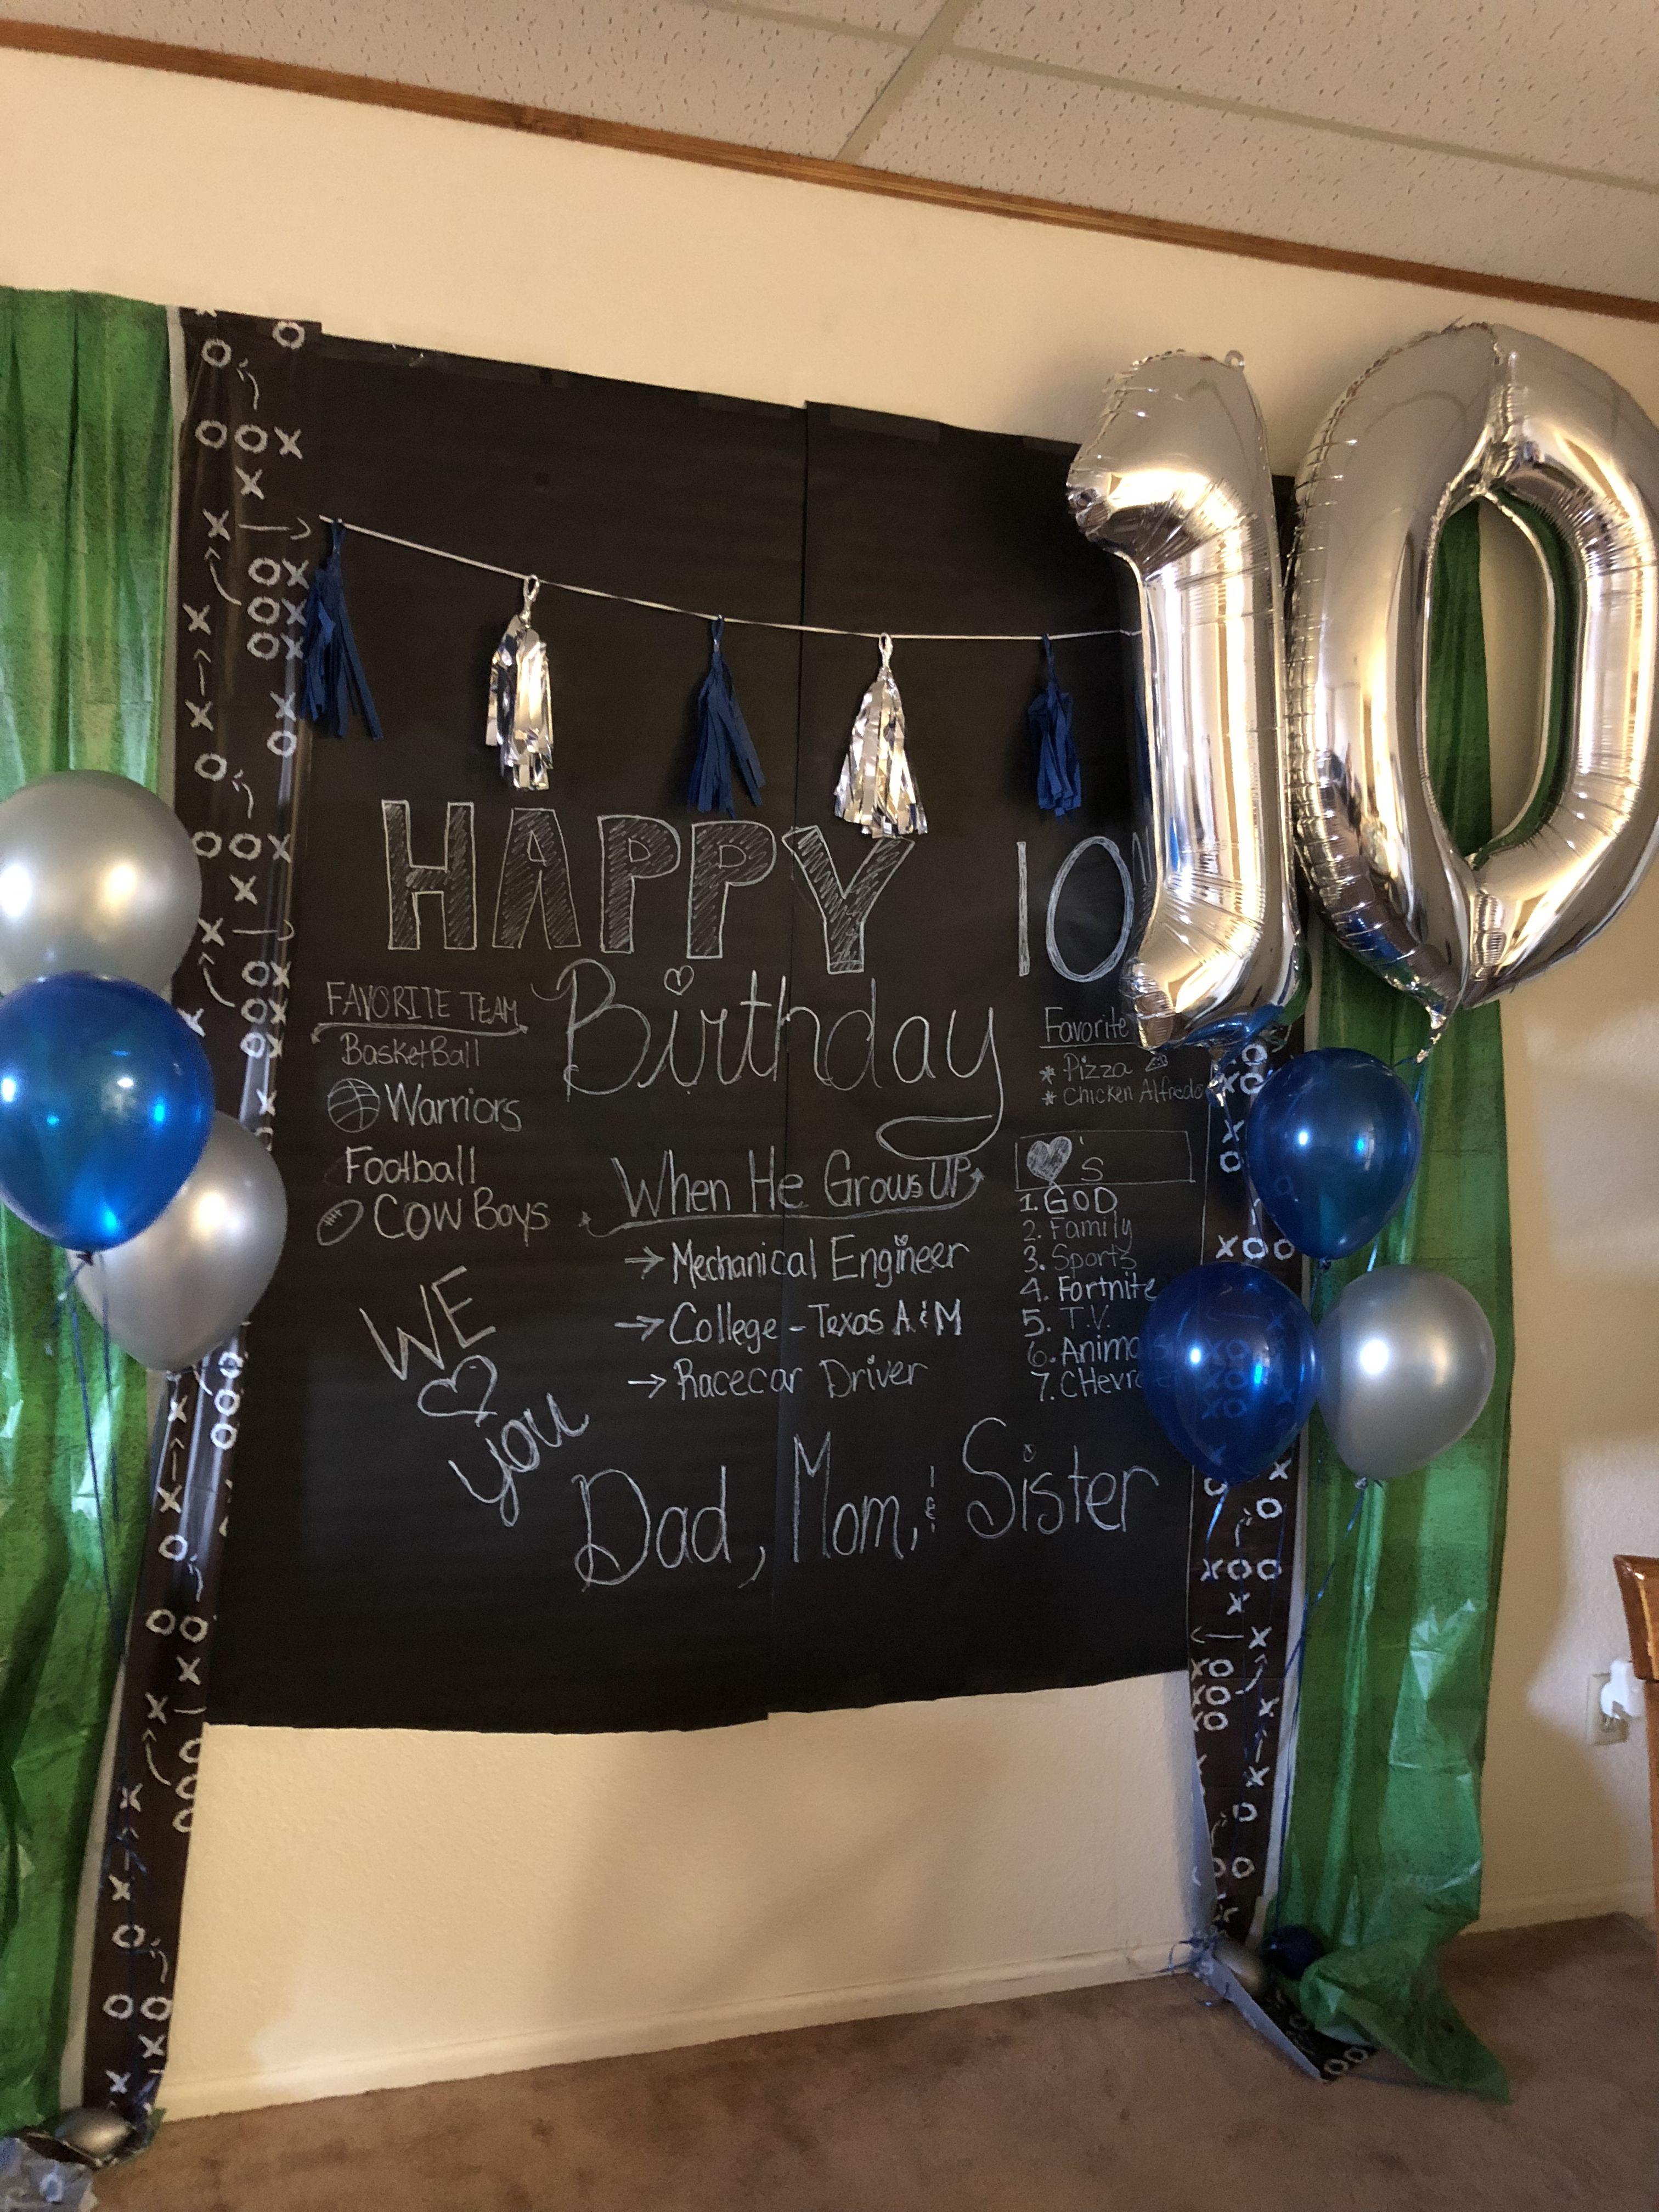 10th Birthday Boy Backdrop 10th Birthday Parties Boys Birthday Party Games Birthday Traditions